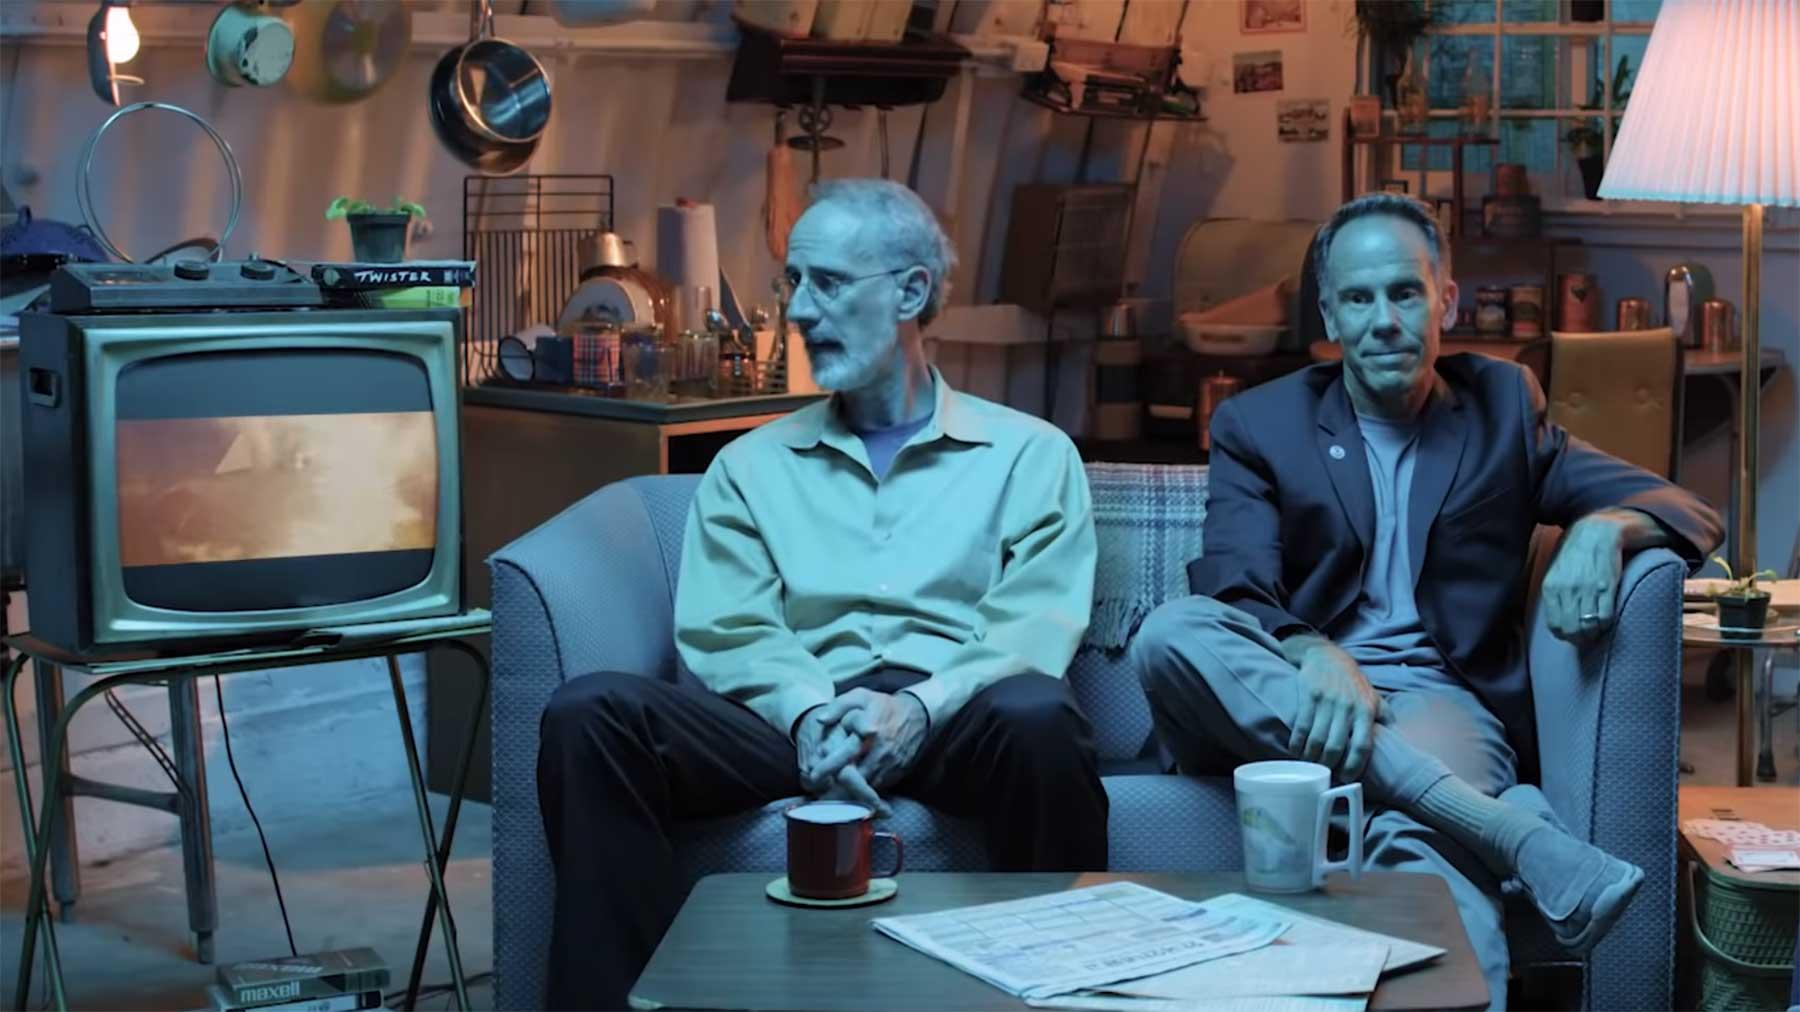 Wissenschaftler beurteilen Szenen aus Katastrophen-Filmen